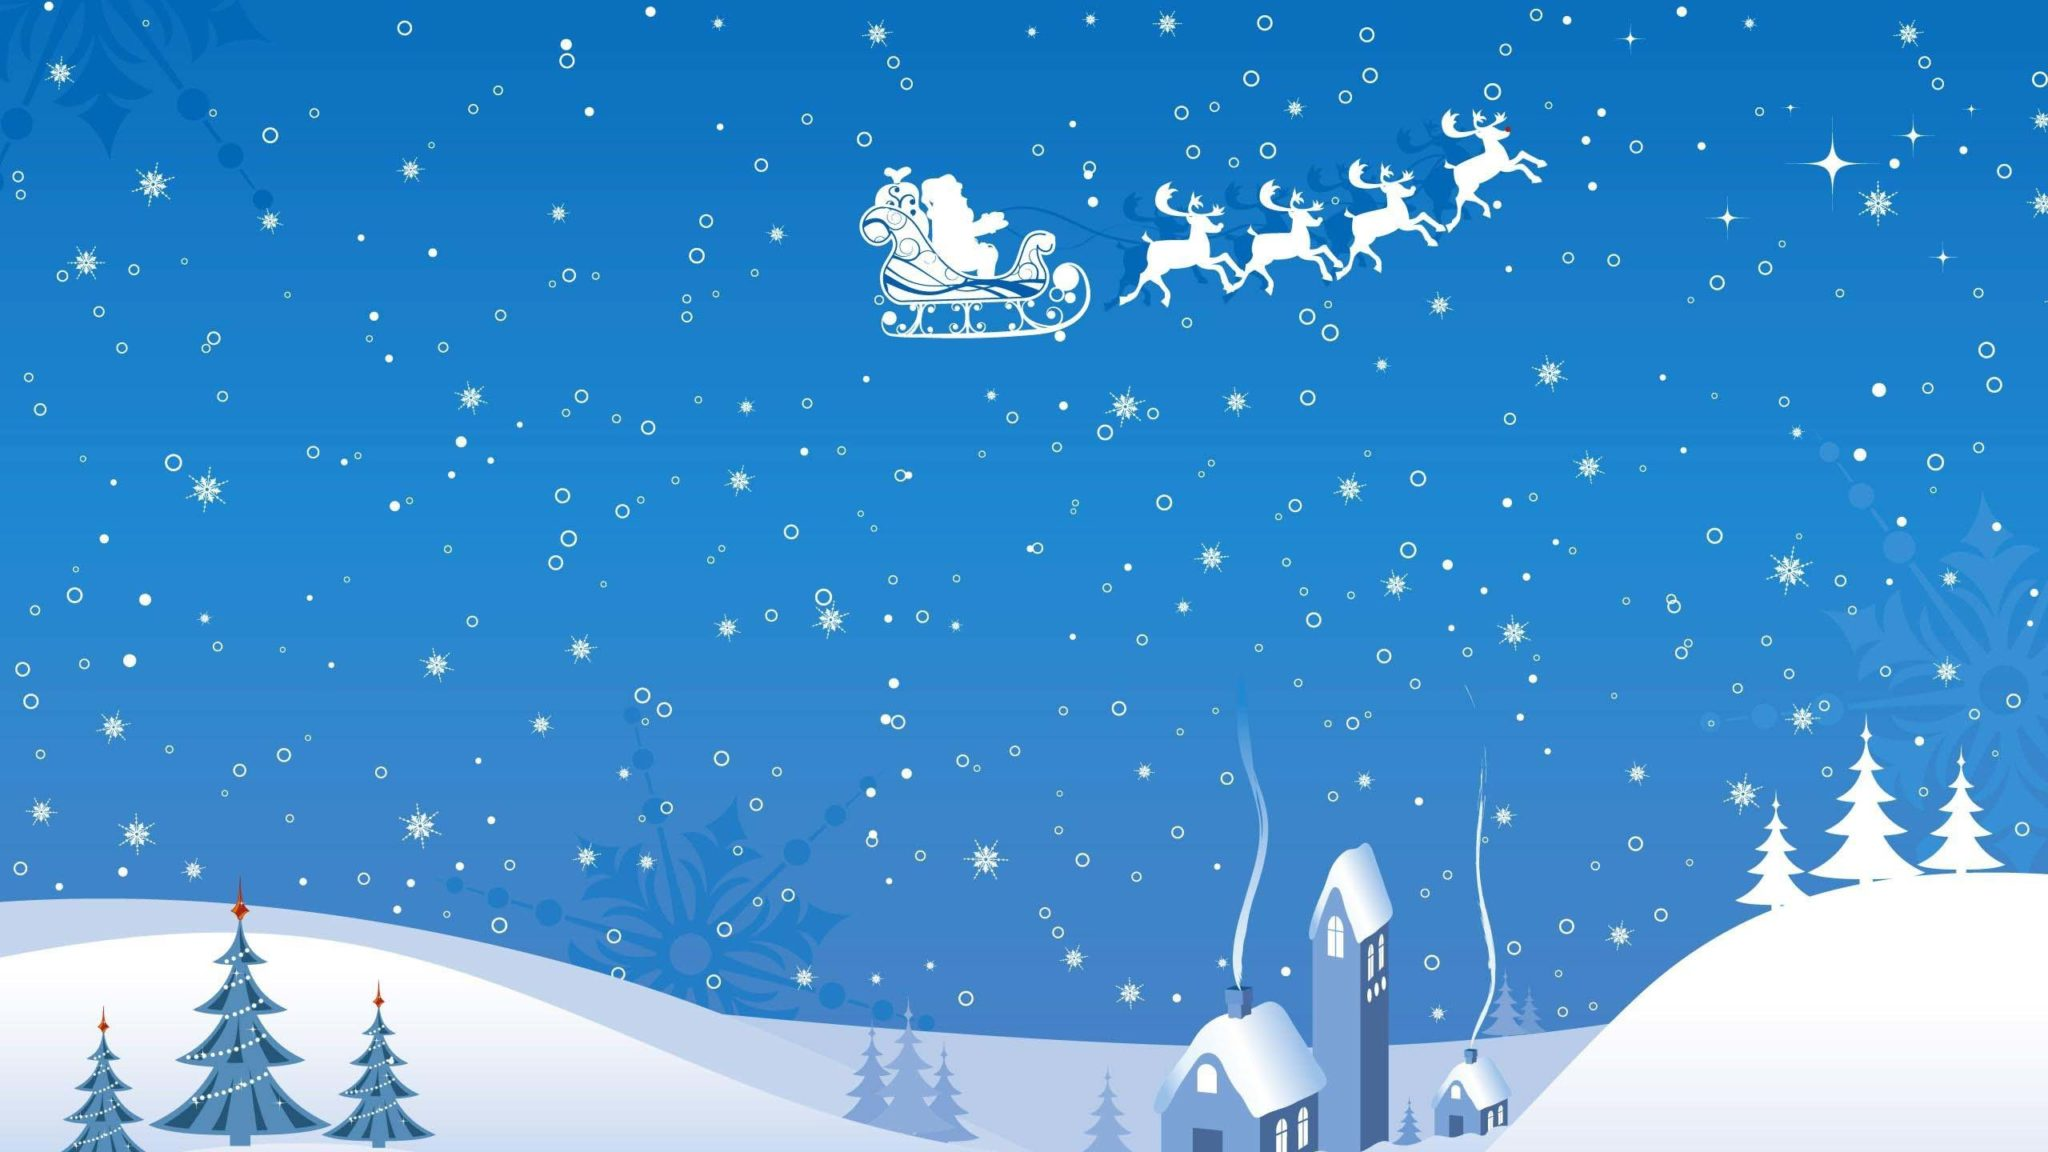 santa claus sleigh reindeer flying night home christmas snowflakes hd wallpapers